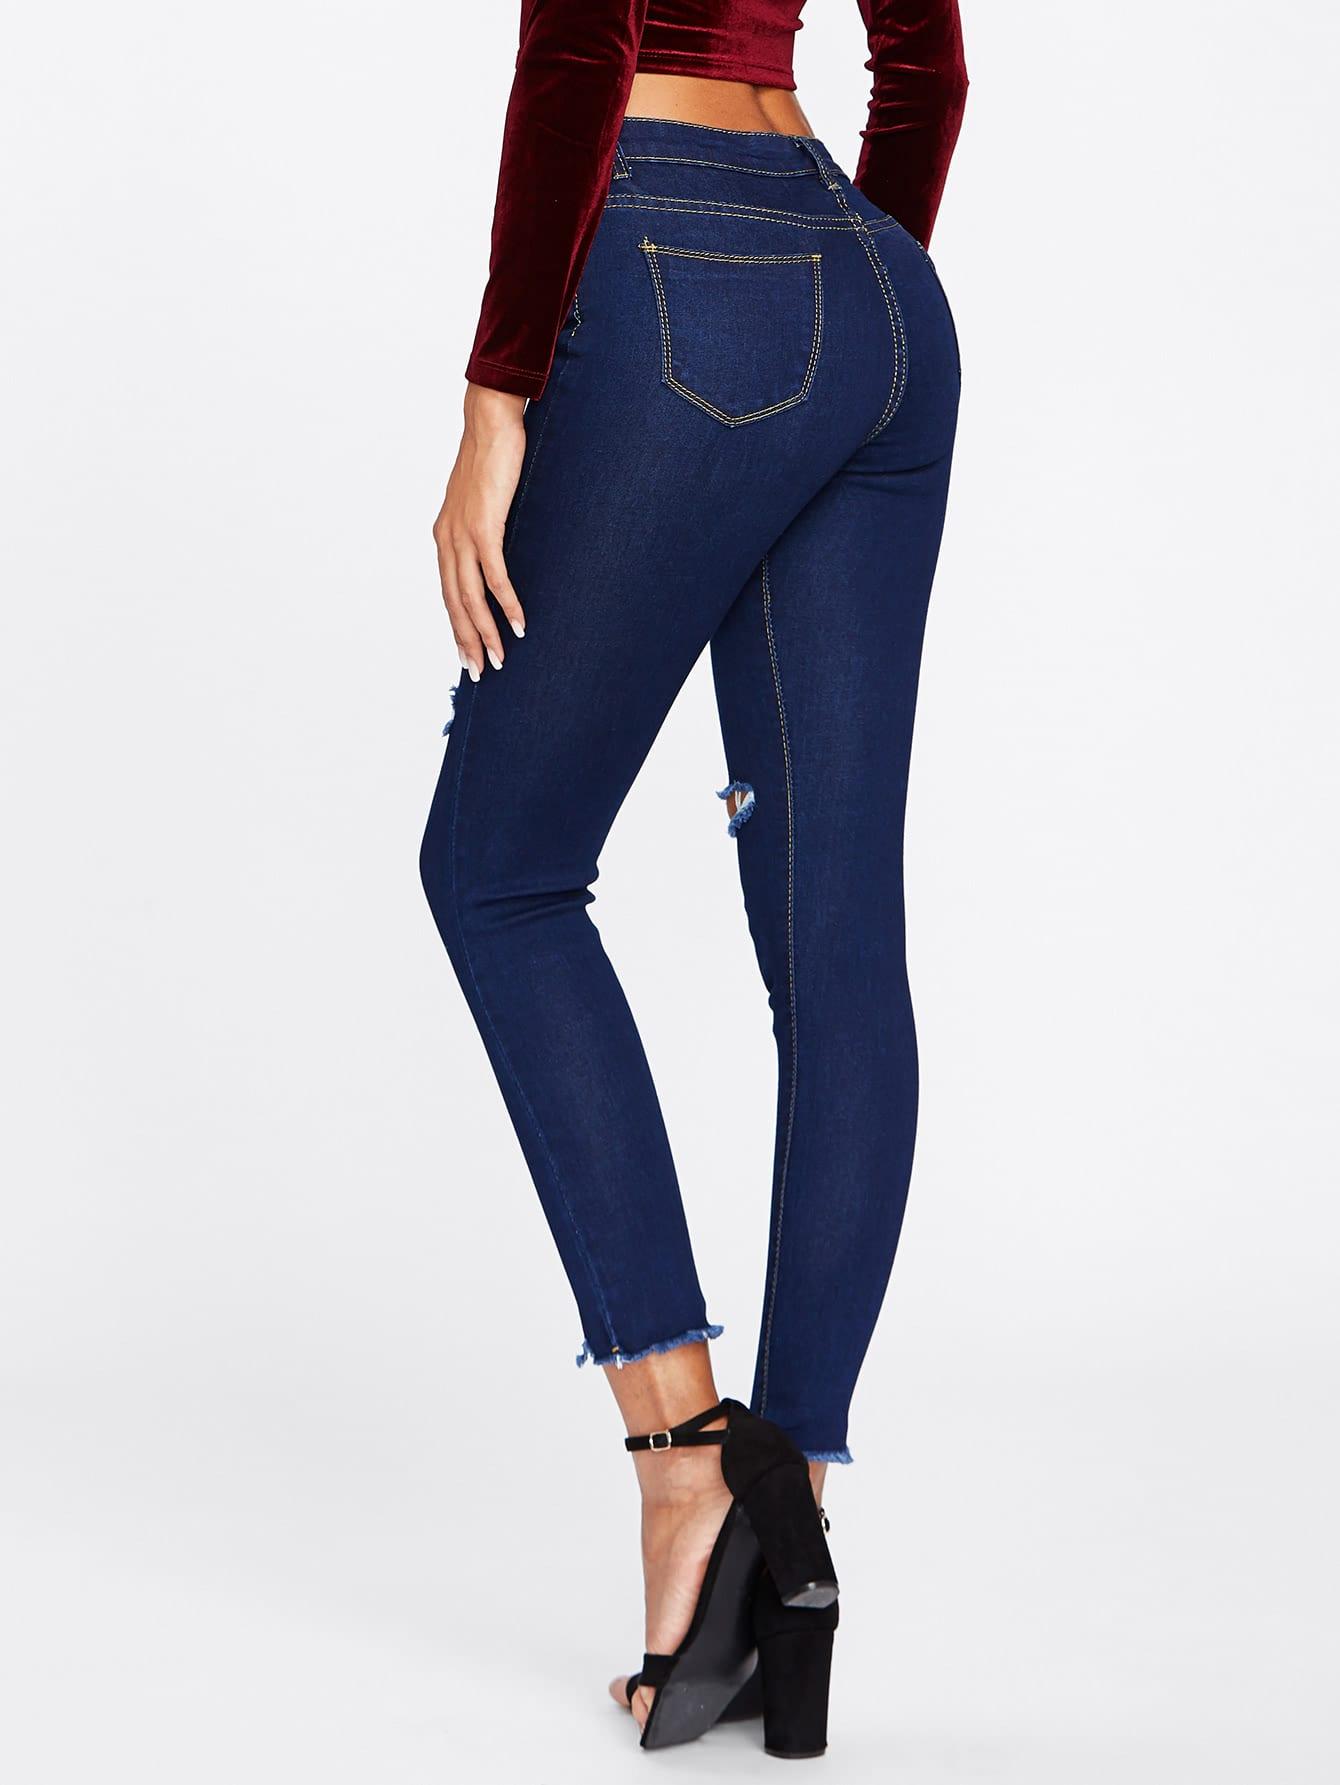 Knee Rips Frayed Hem Skinny Jeans